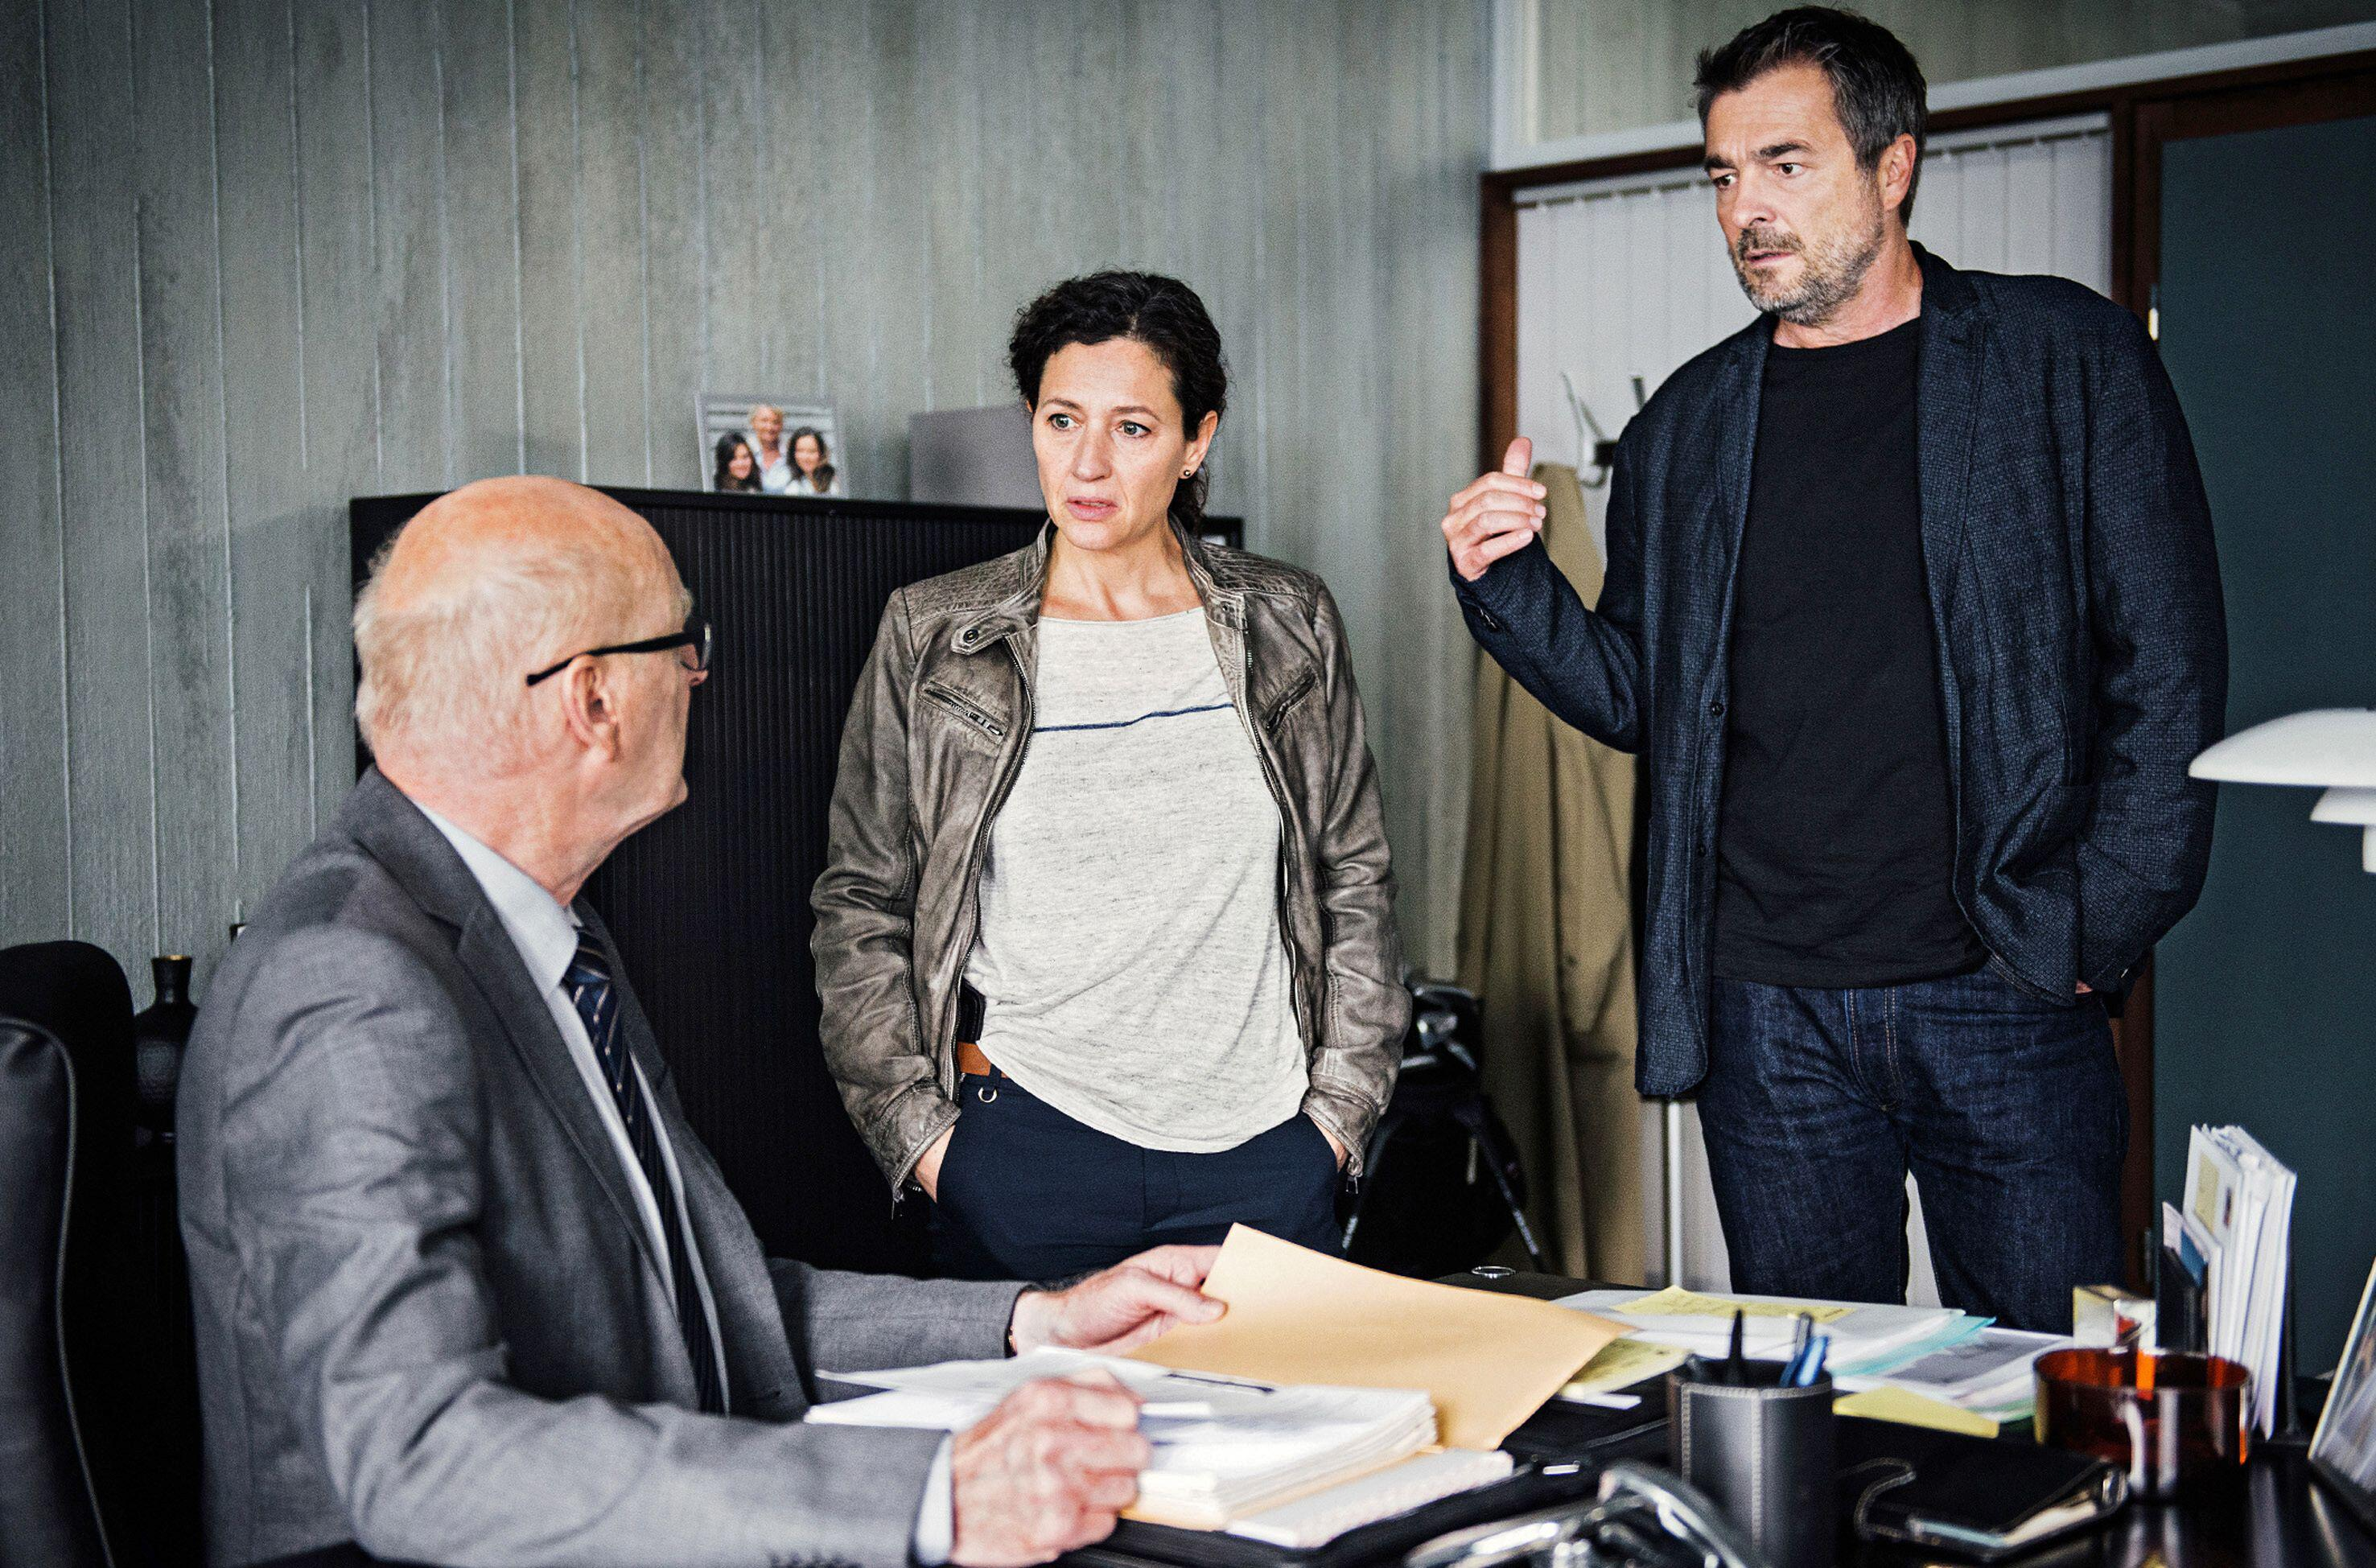 Bild zu Jean-Pierre Cornu, Stefan Gubser, Delia Mayer, Tatort, Luzern